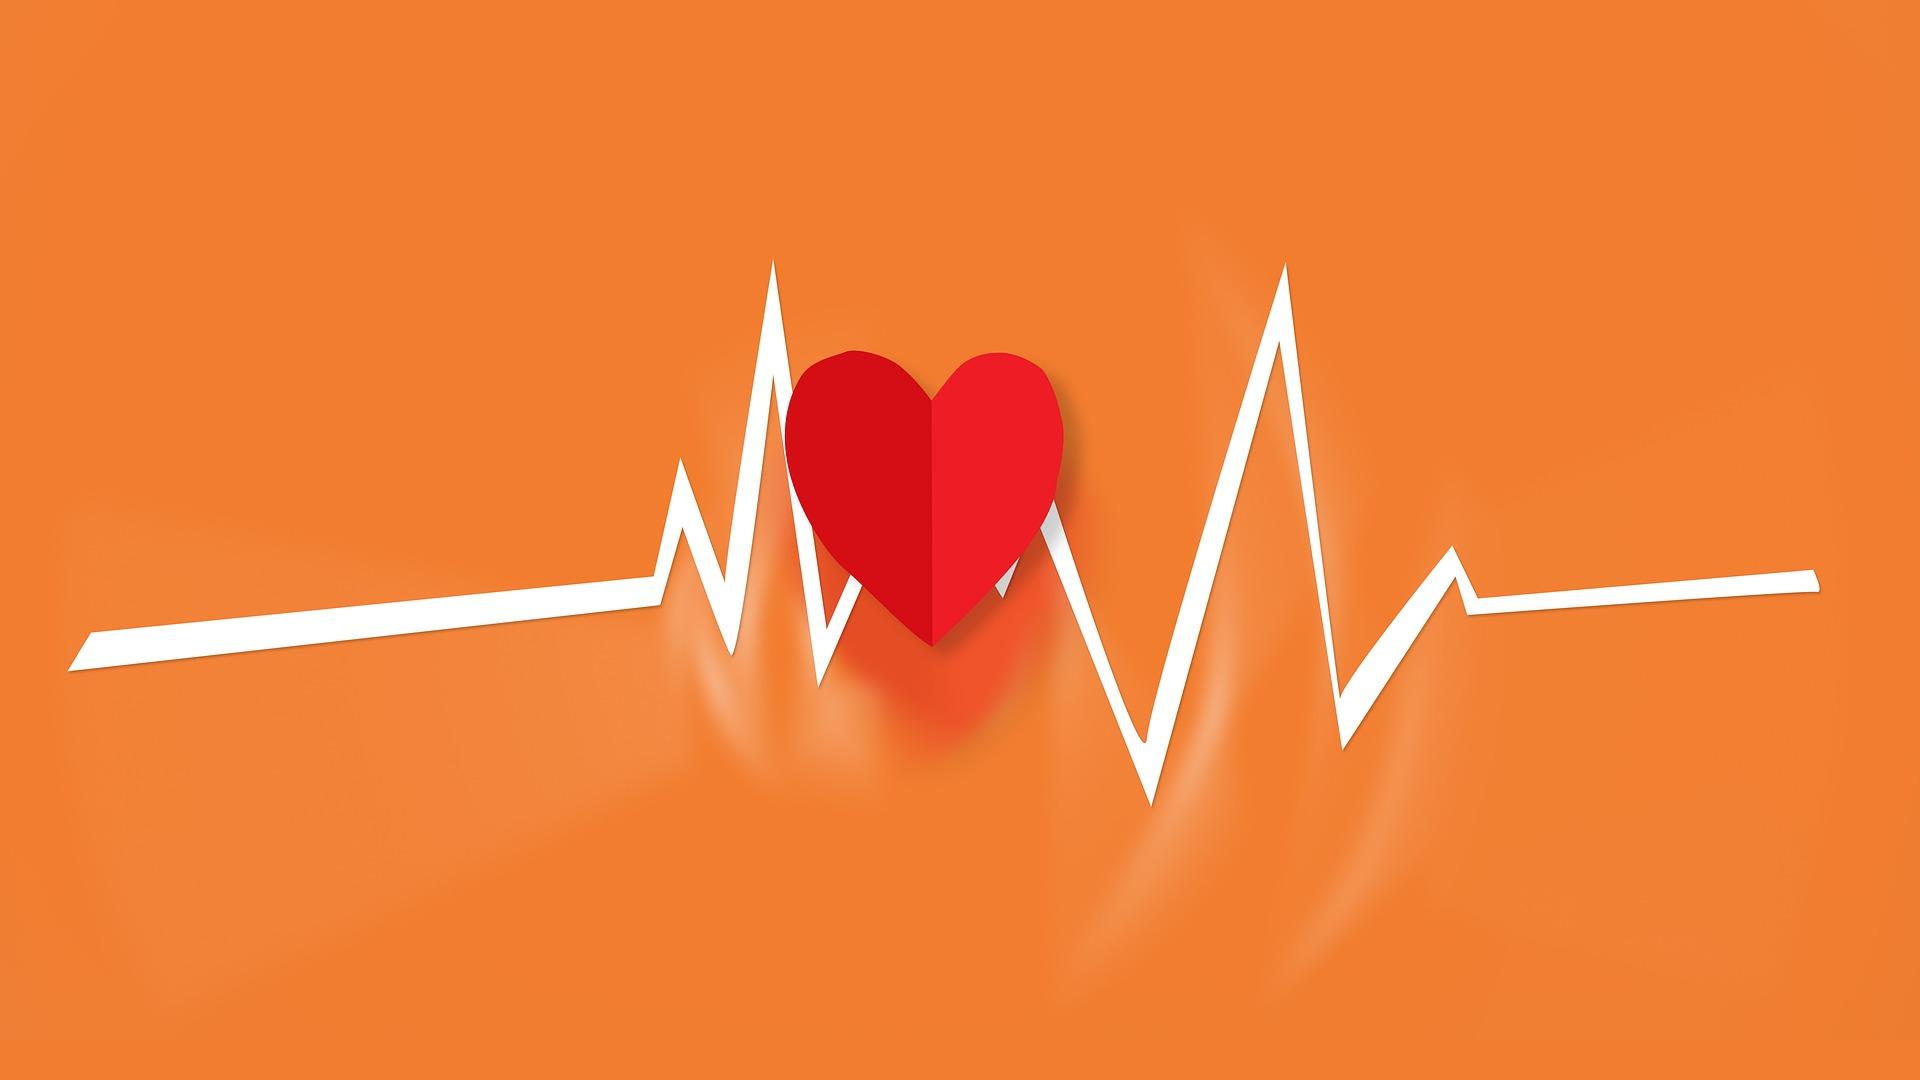 Harvard Medical School advocates for preventative medicine in recent article